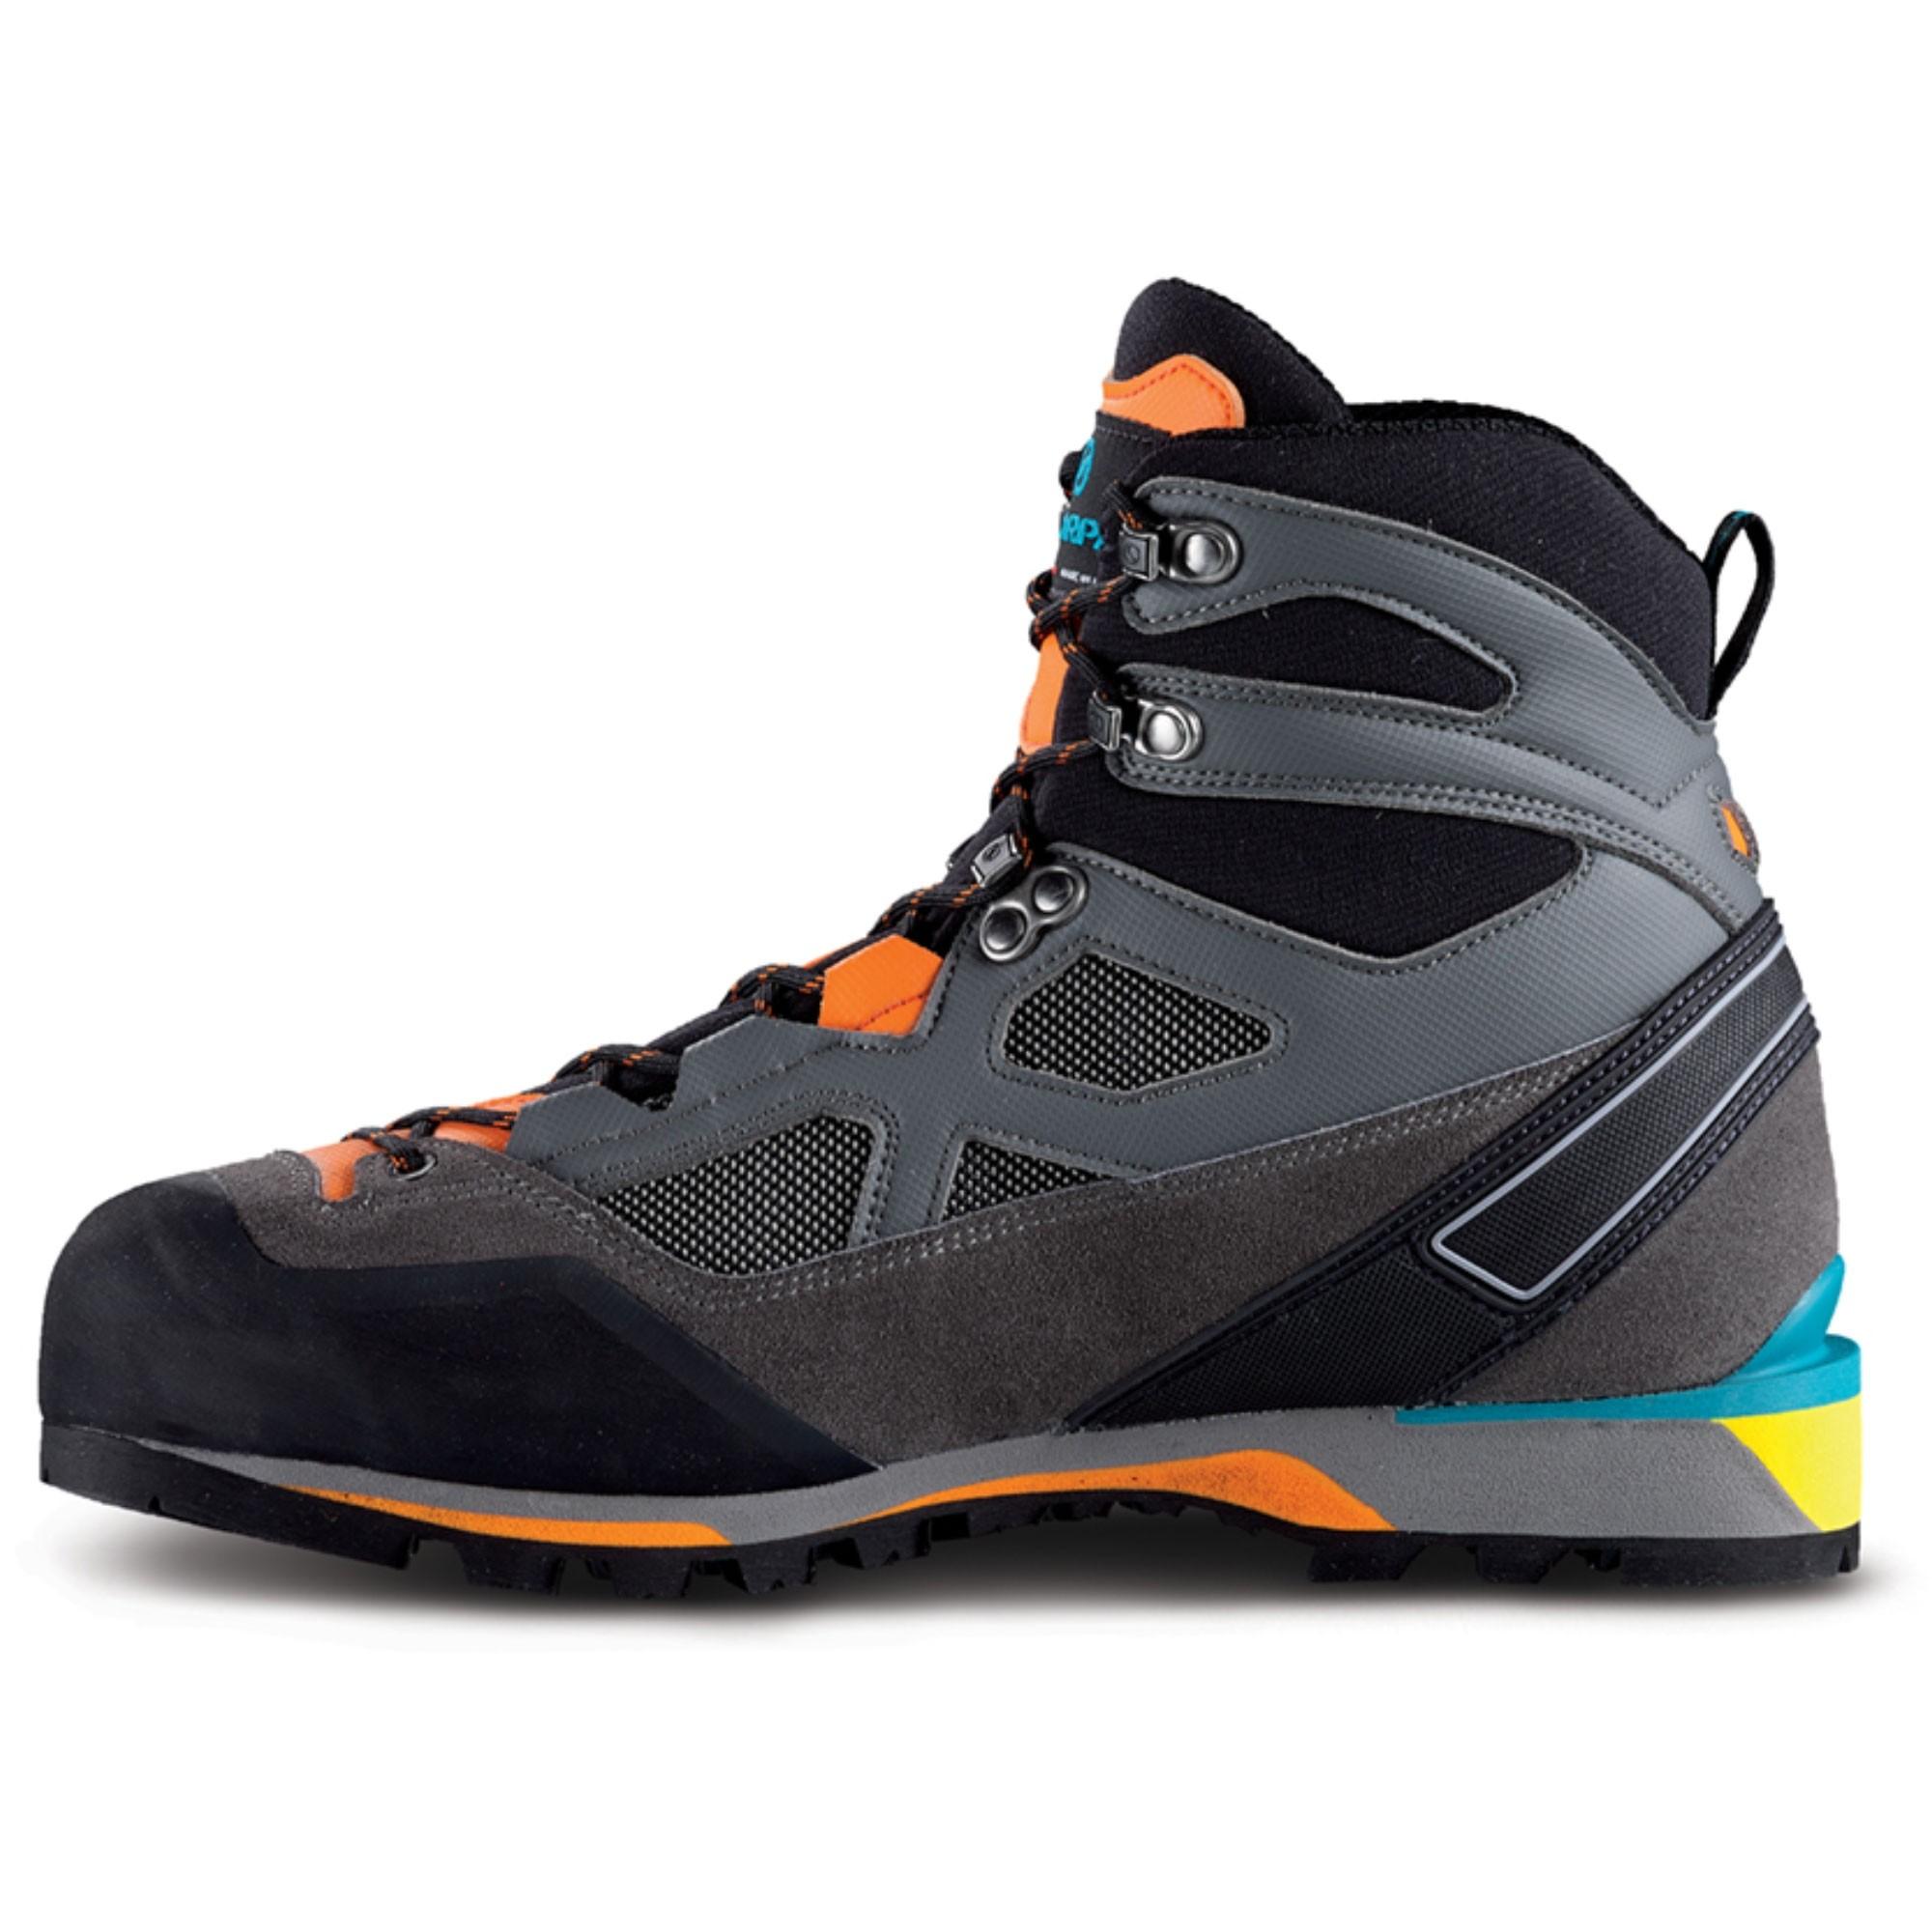 Scarpa Rebel Lite Mountaineering/Walking Boot